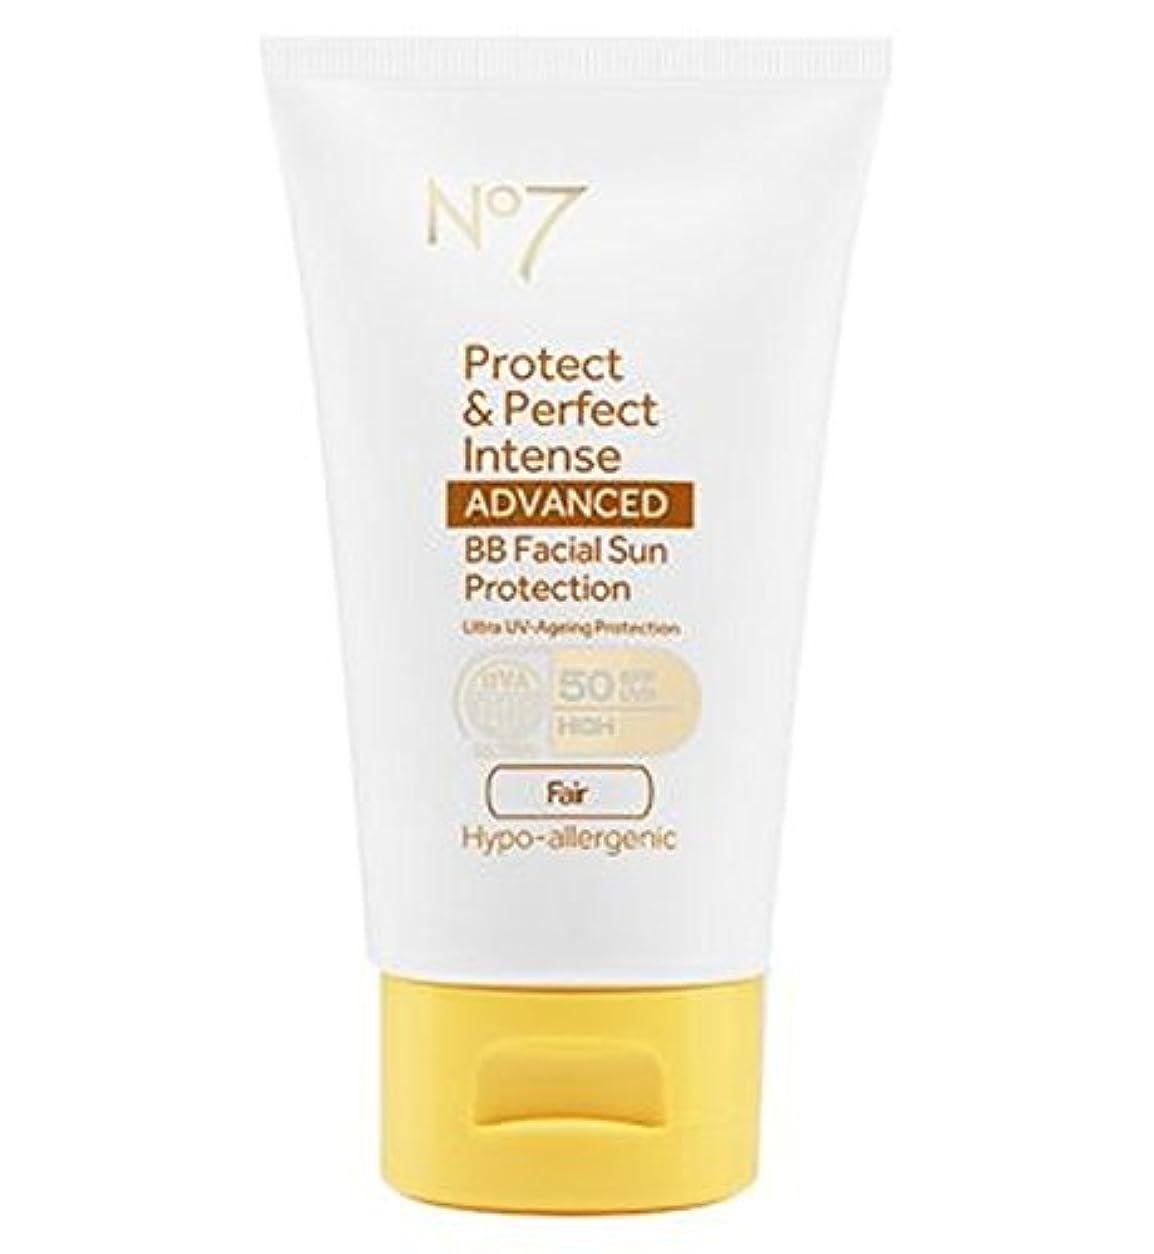 No7保護&完璧な強烈な先進Bb顔の日焼け防止Spf50フェア50ミリリットル (No7) (x2) - No7 Protect & Perfect Intense ADVANCED BB Facial Sun Protection...